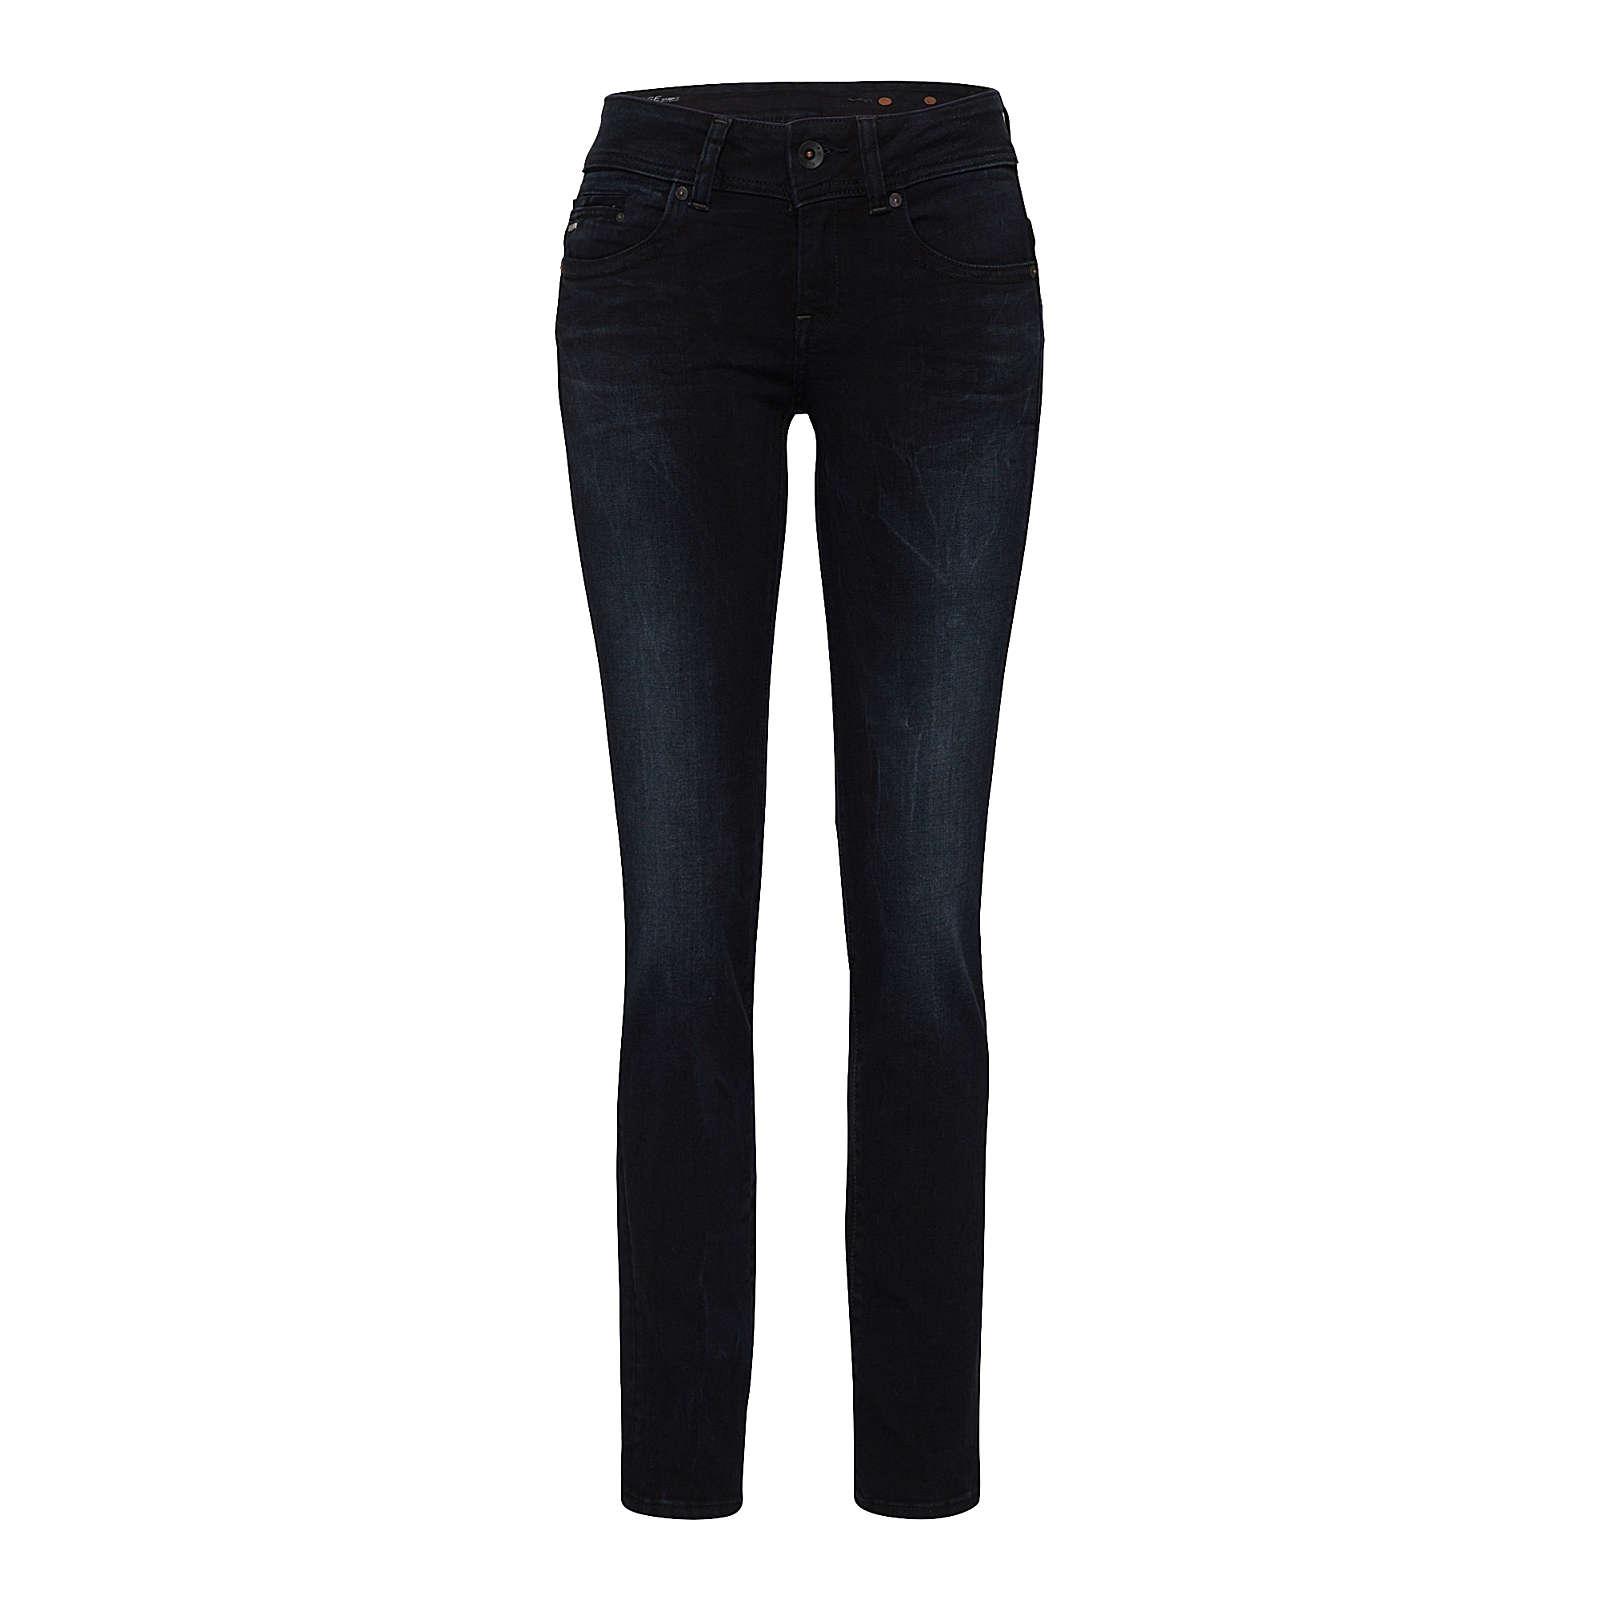 G-STAR RAW Jeans Midge Saddle Mid Straight Jeanshosen black denim Damen Gr. W24/L32